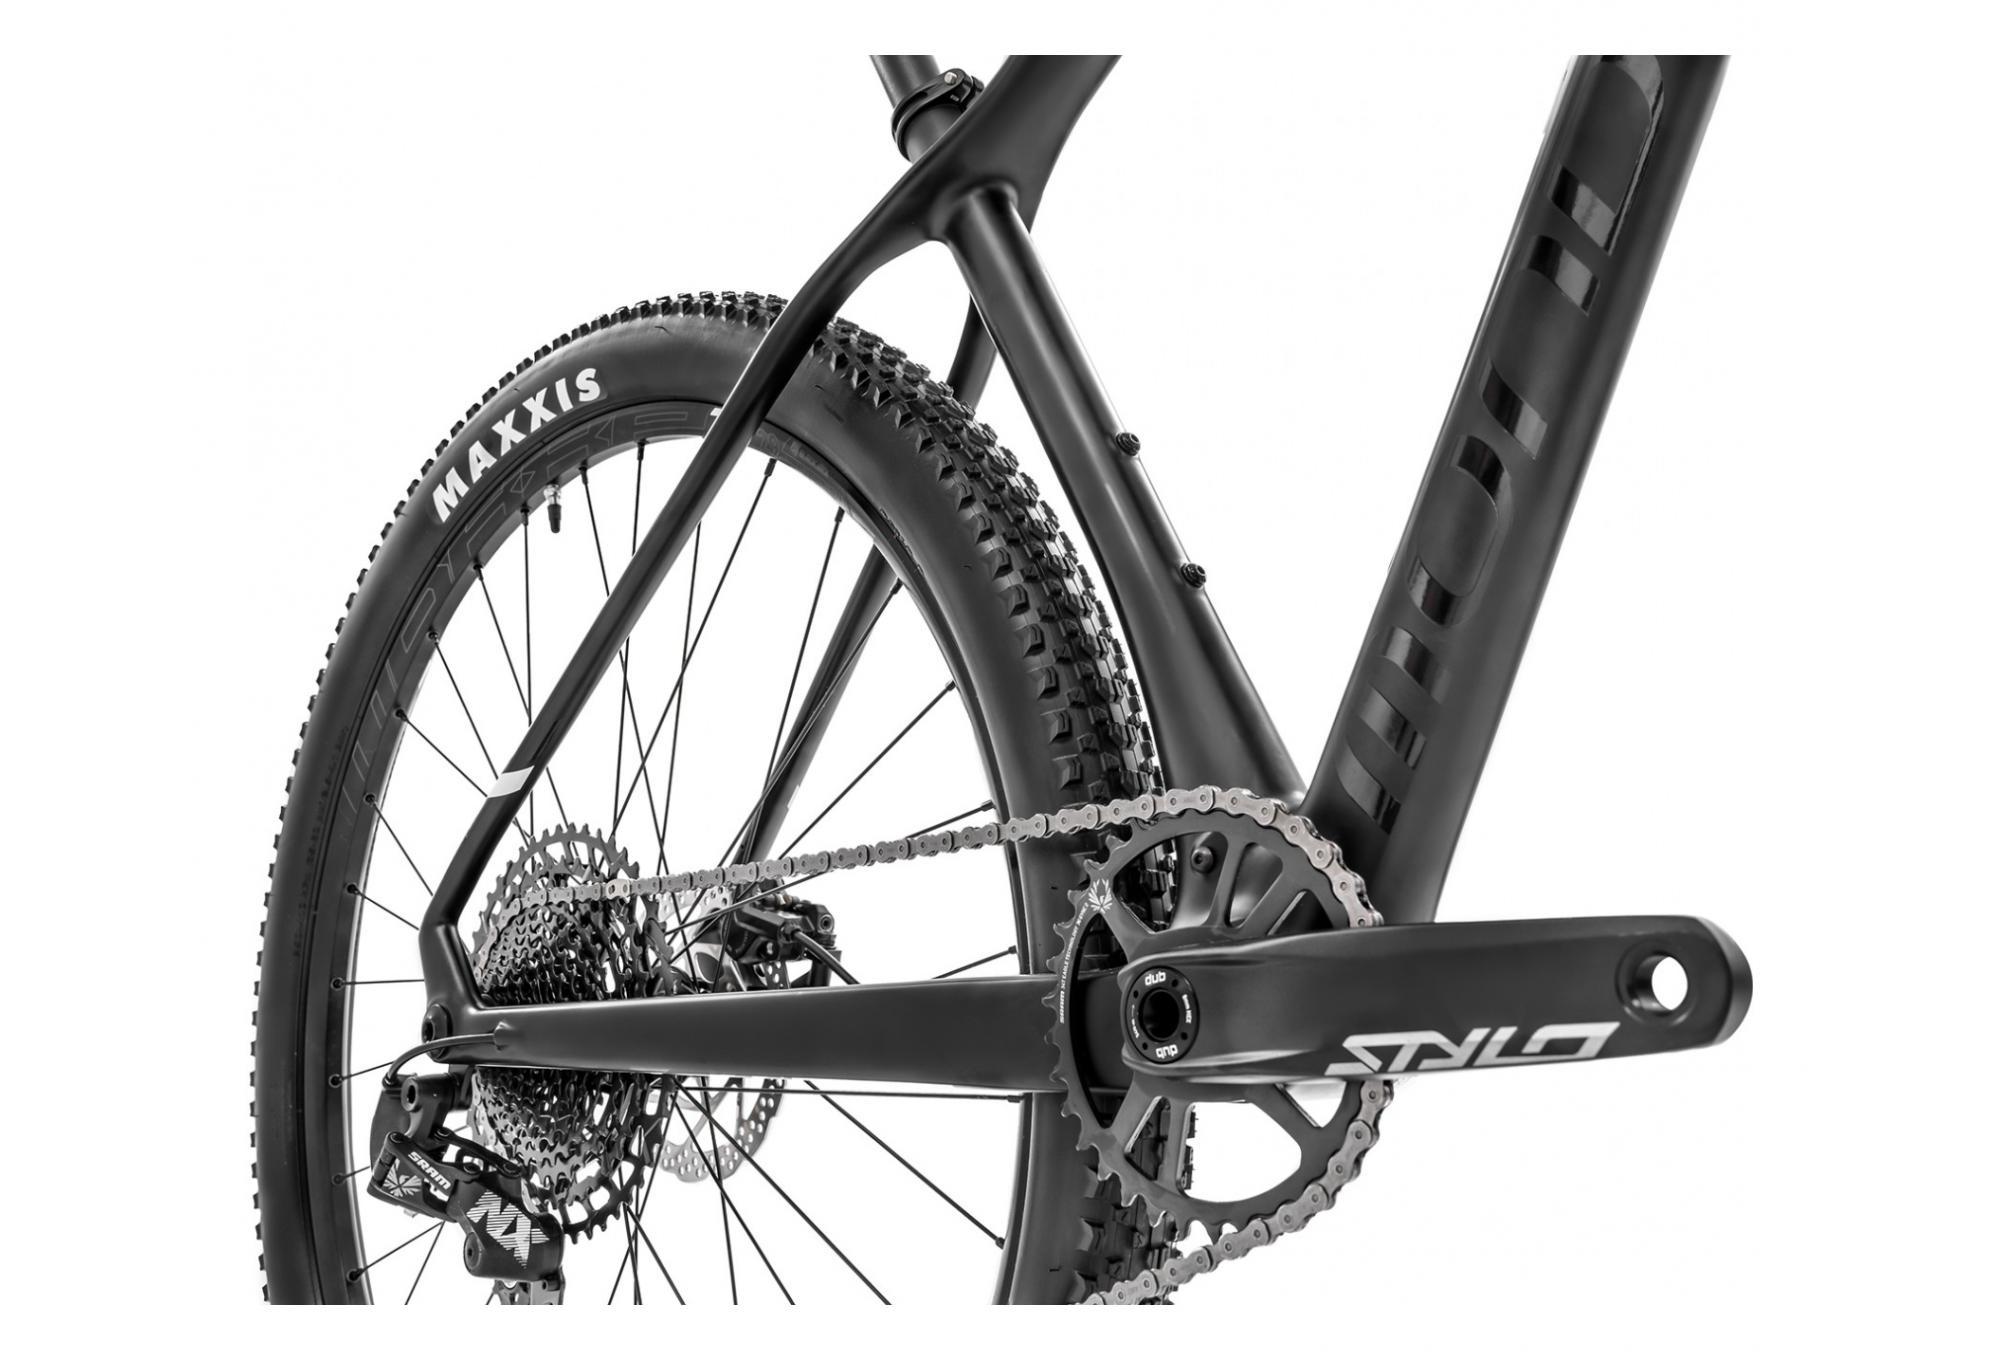 SRAM 2018 niveau T mountain bike VTT disque hydraulique de frein avant-Noir